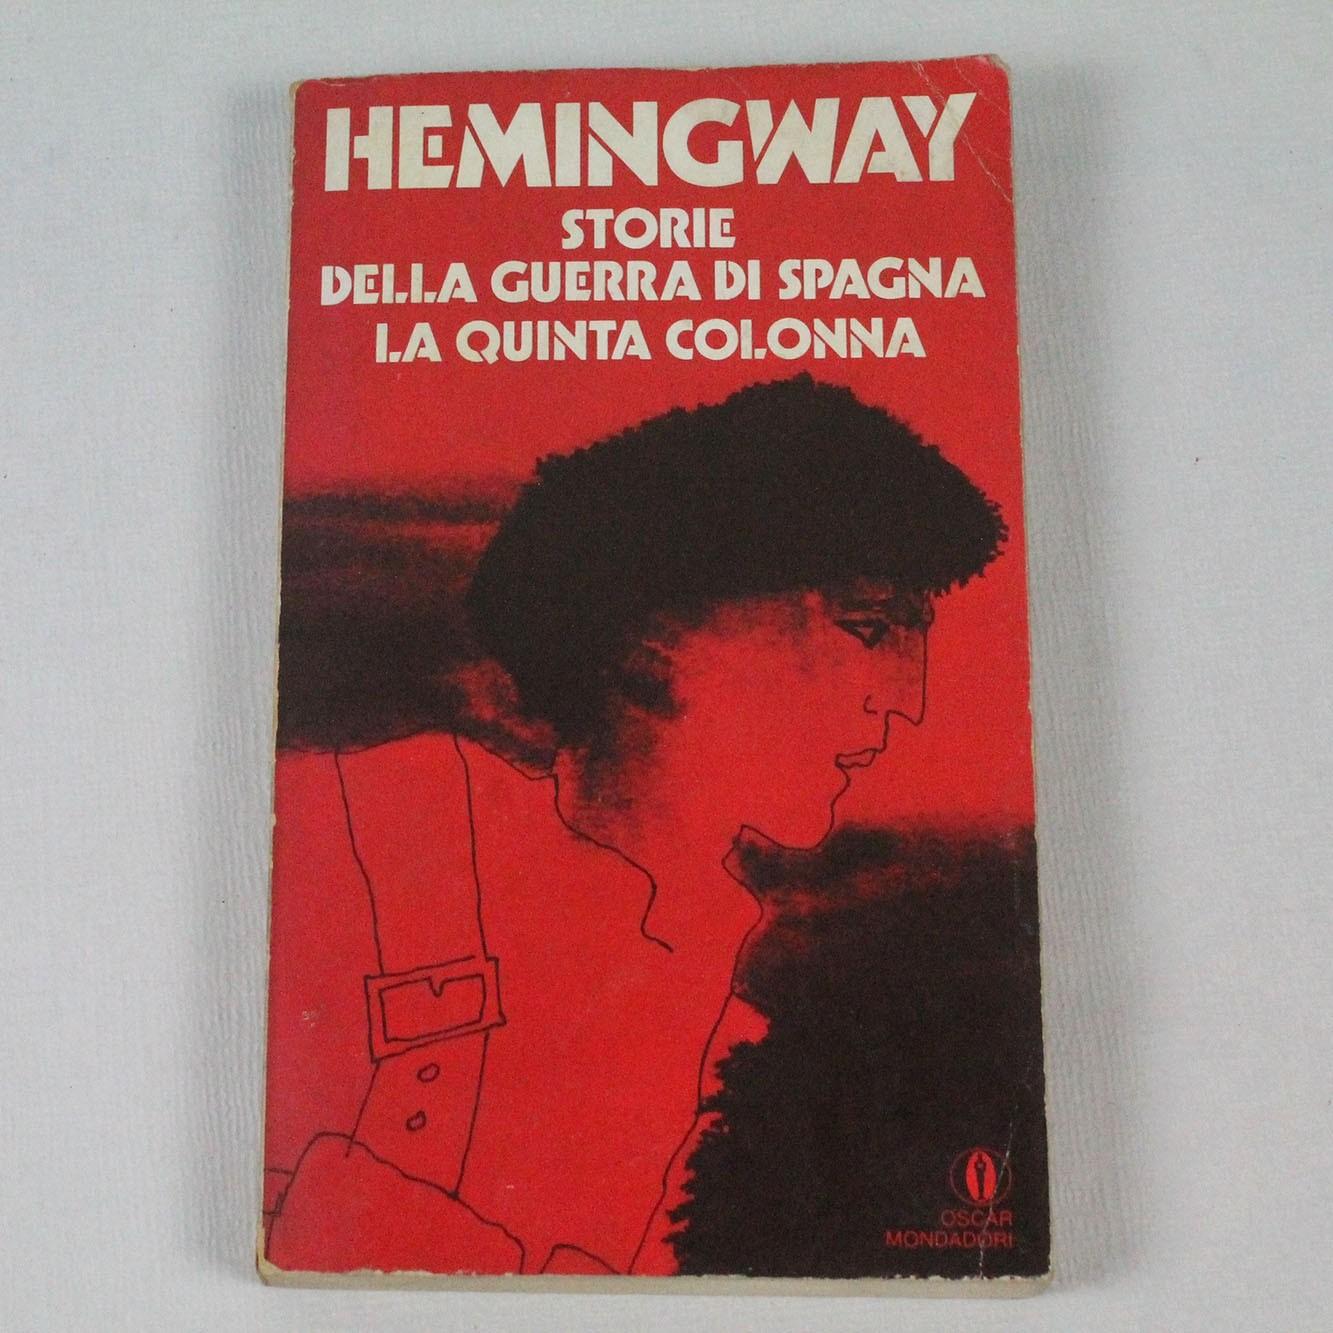 LIBIT-STORIE DELLA GUERRA DI SPAGNA LA QUINTA COLONNA-HEMINGWAY